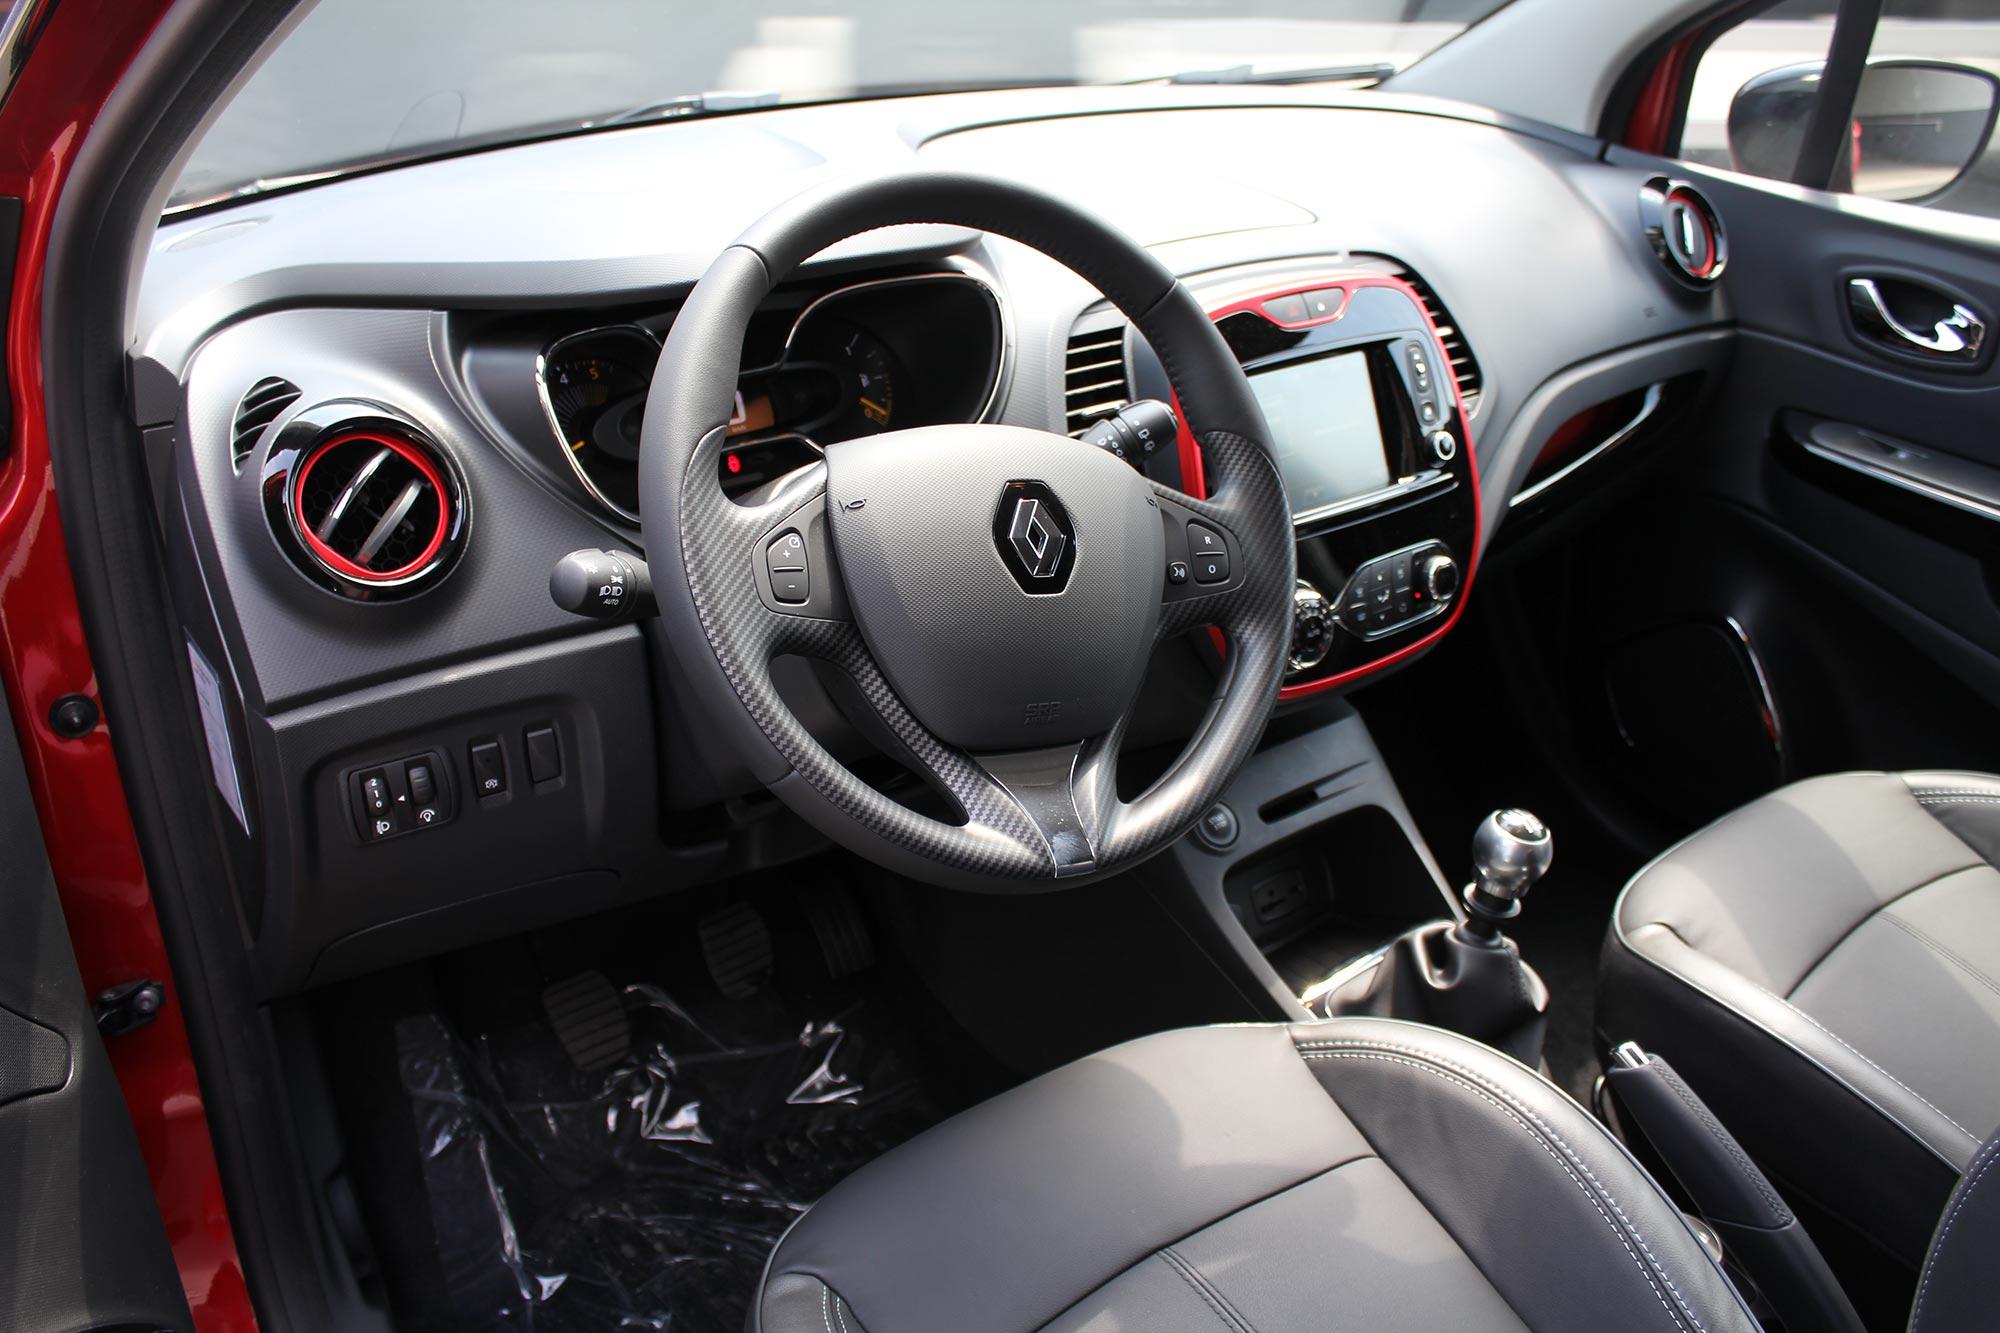 Renault Captur 1.5 Dci 110 Vlamrood-zwart - garage goethals wingene